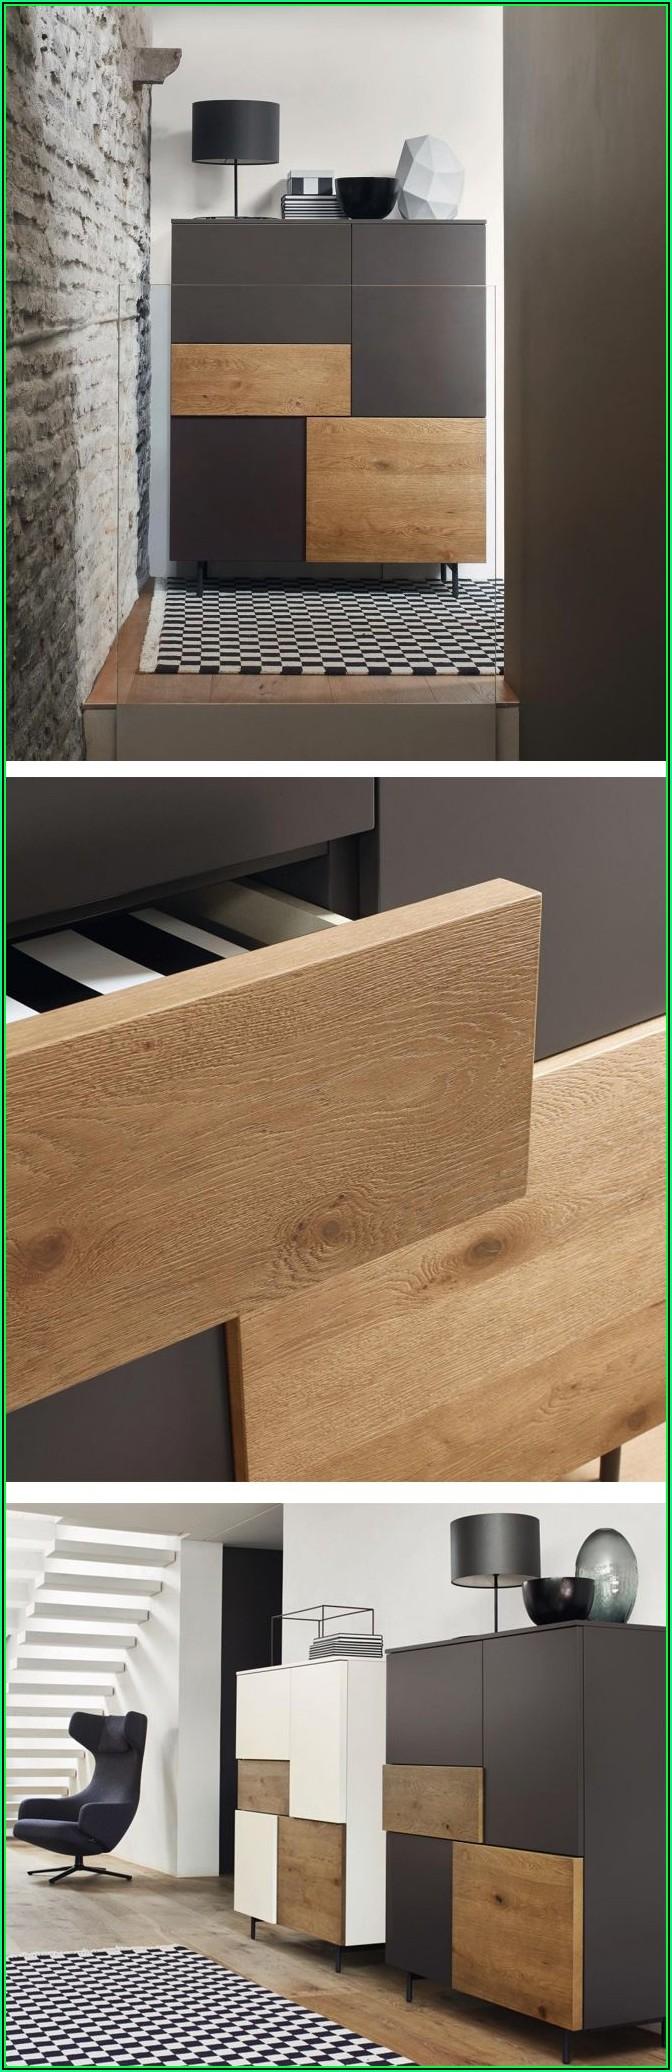 Ikea Schlafzimmer Highboard